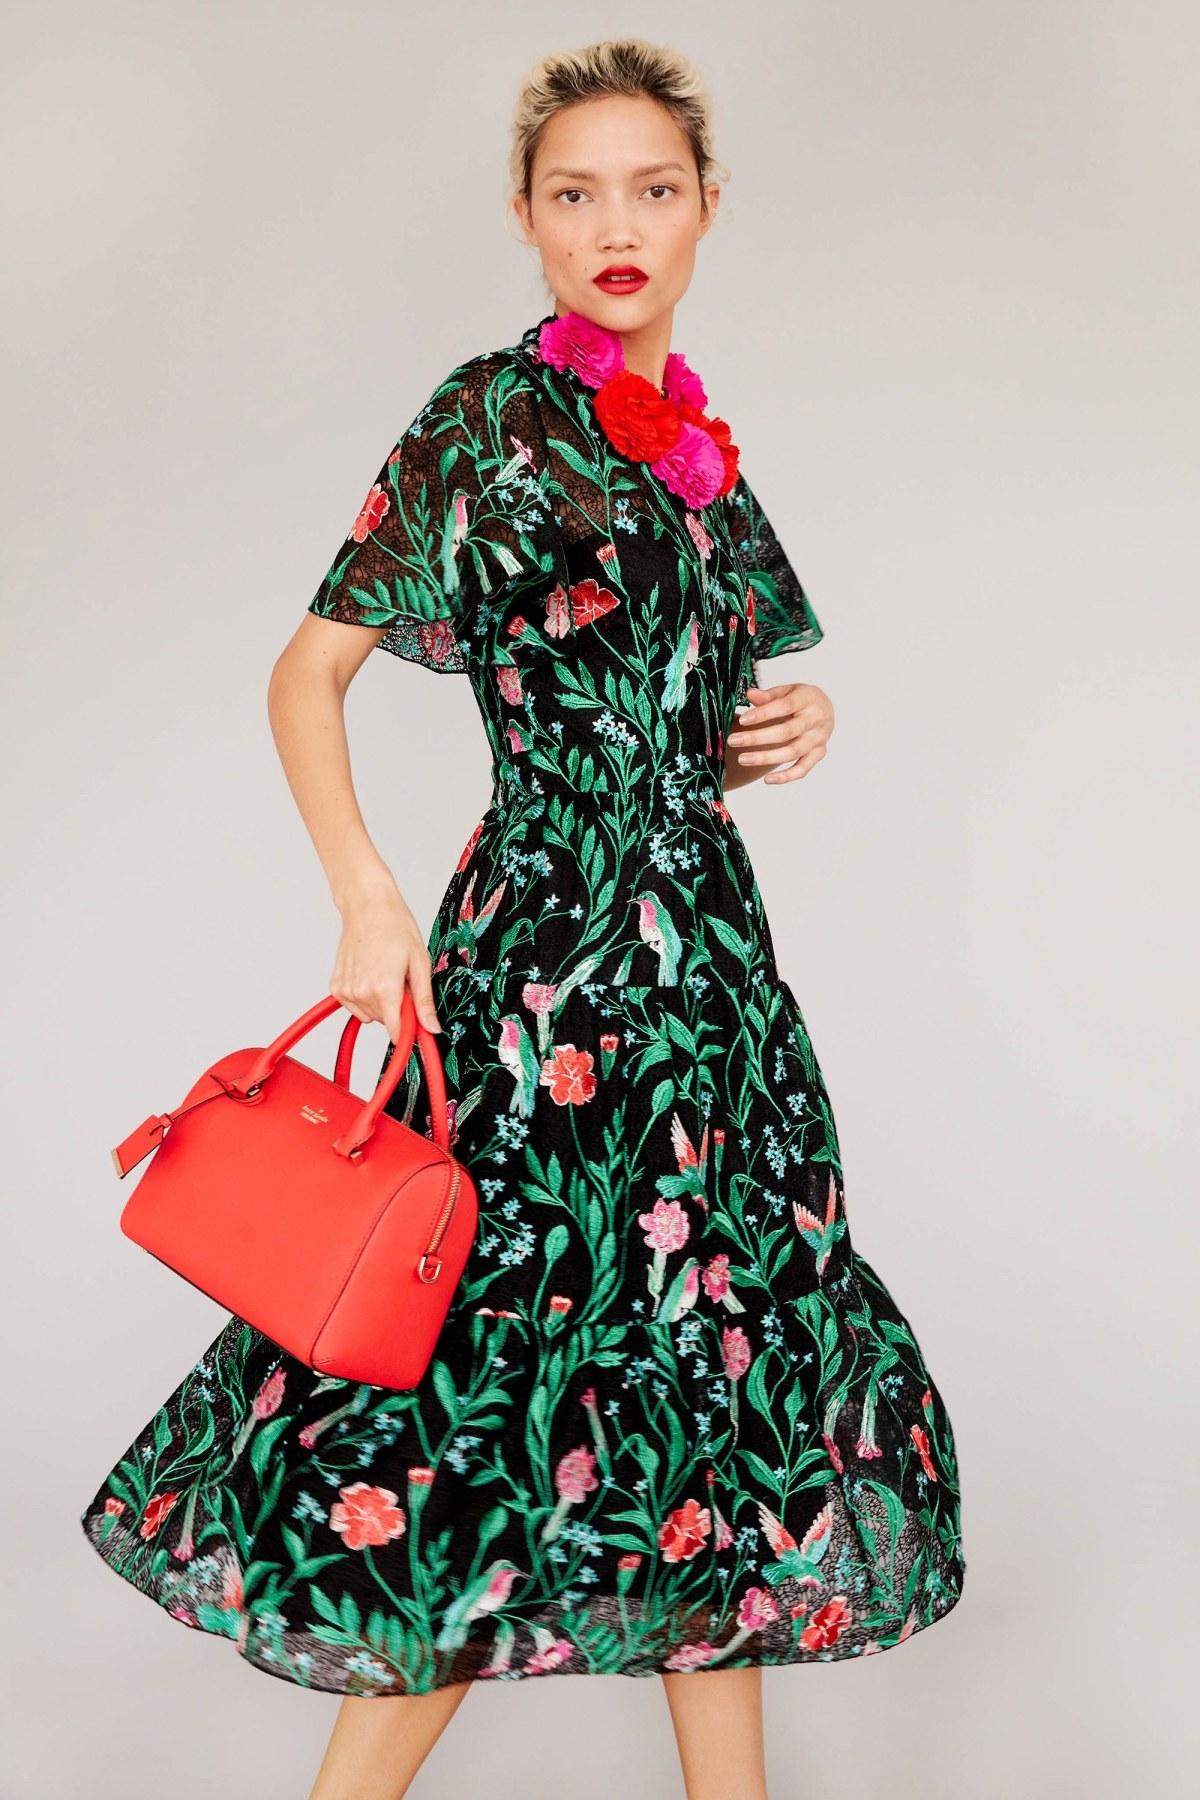 kate-spade-pre-fall-2017-fashion-show-the-impression-01